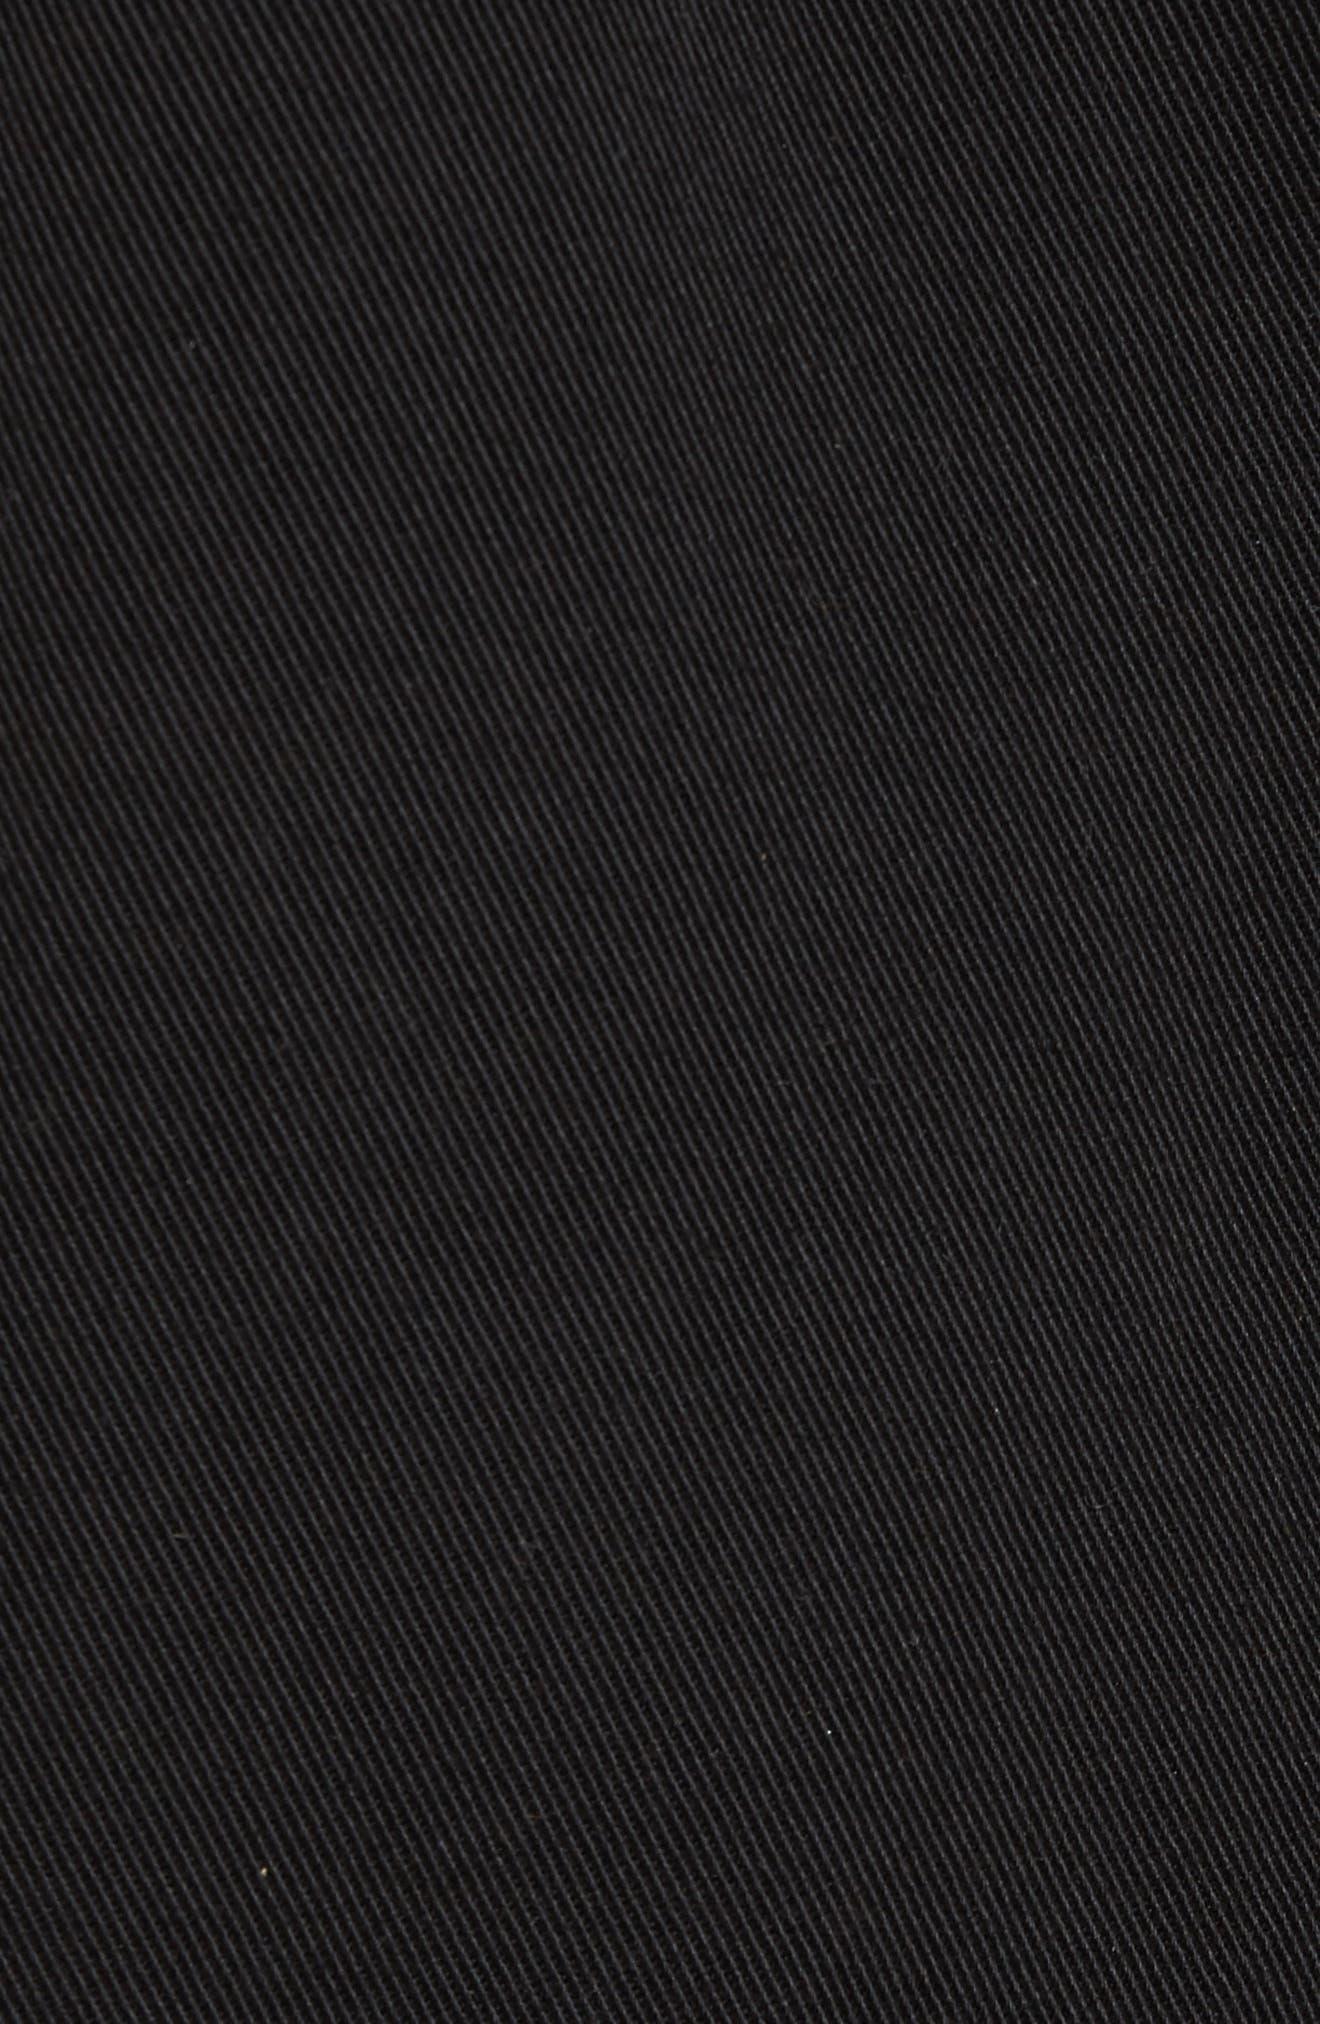 Alec Denim Jacket with Faux Shearling Trim,                             Alternate thumbnail 6, color,